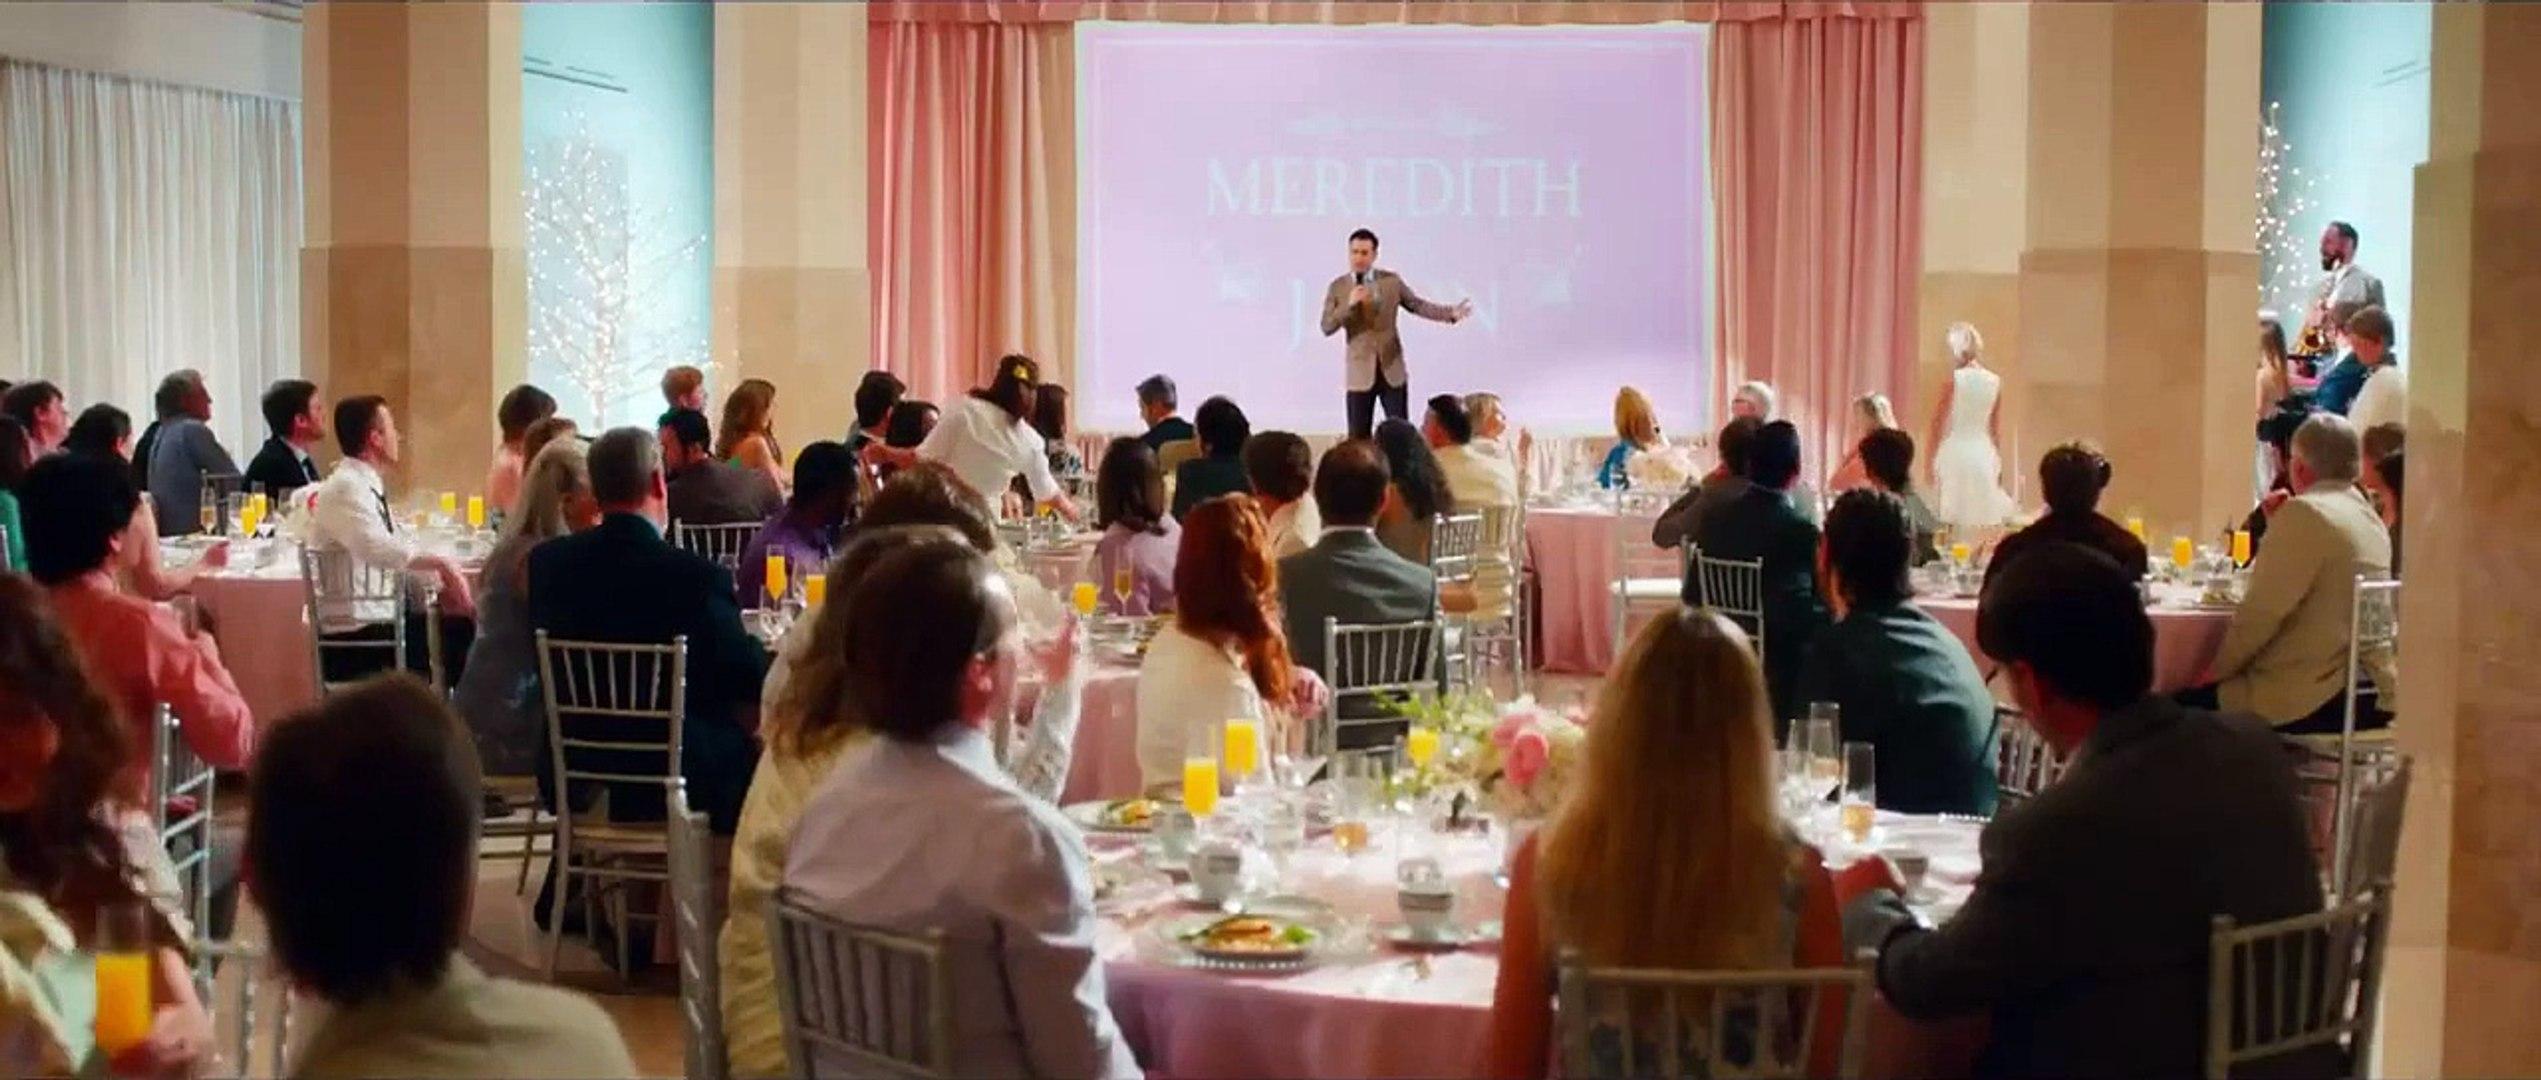 DIRTY GRANDPA - Official Trailer #1 (2016) Zac Efron, Robert De Niro Comedy Movie HD